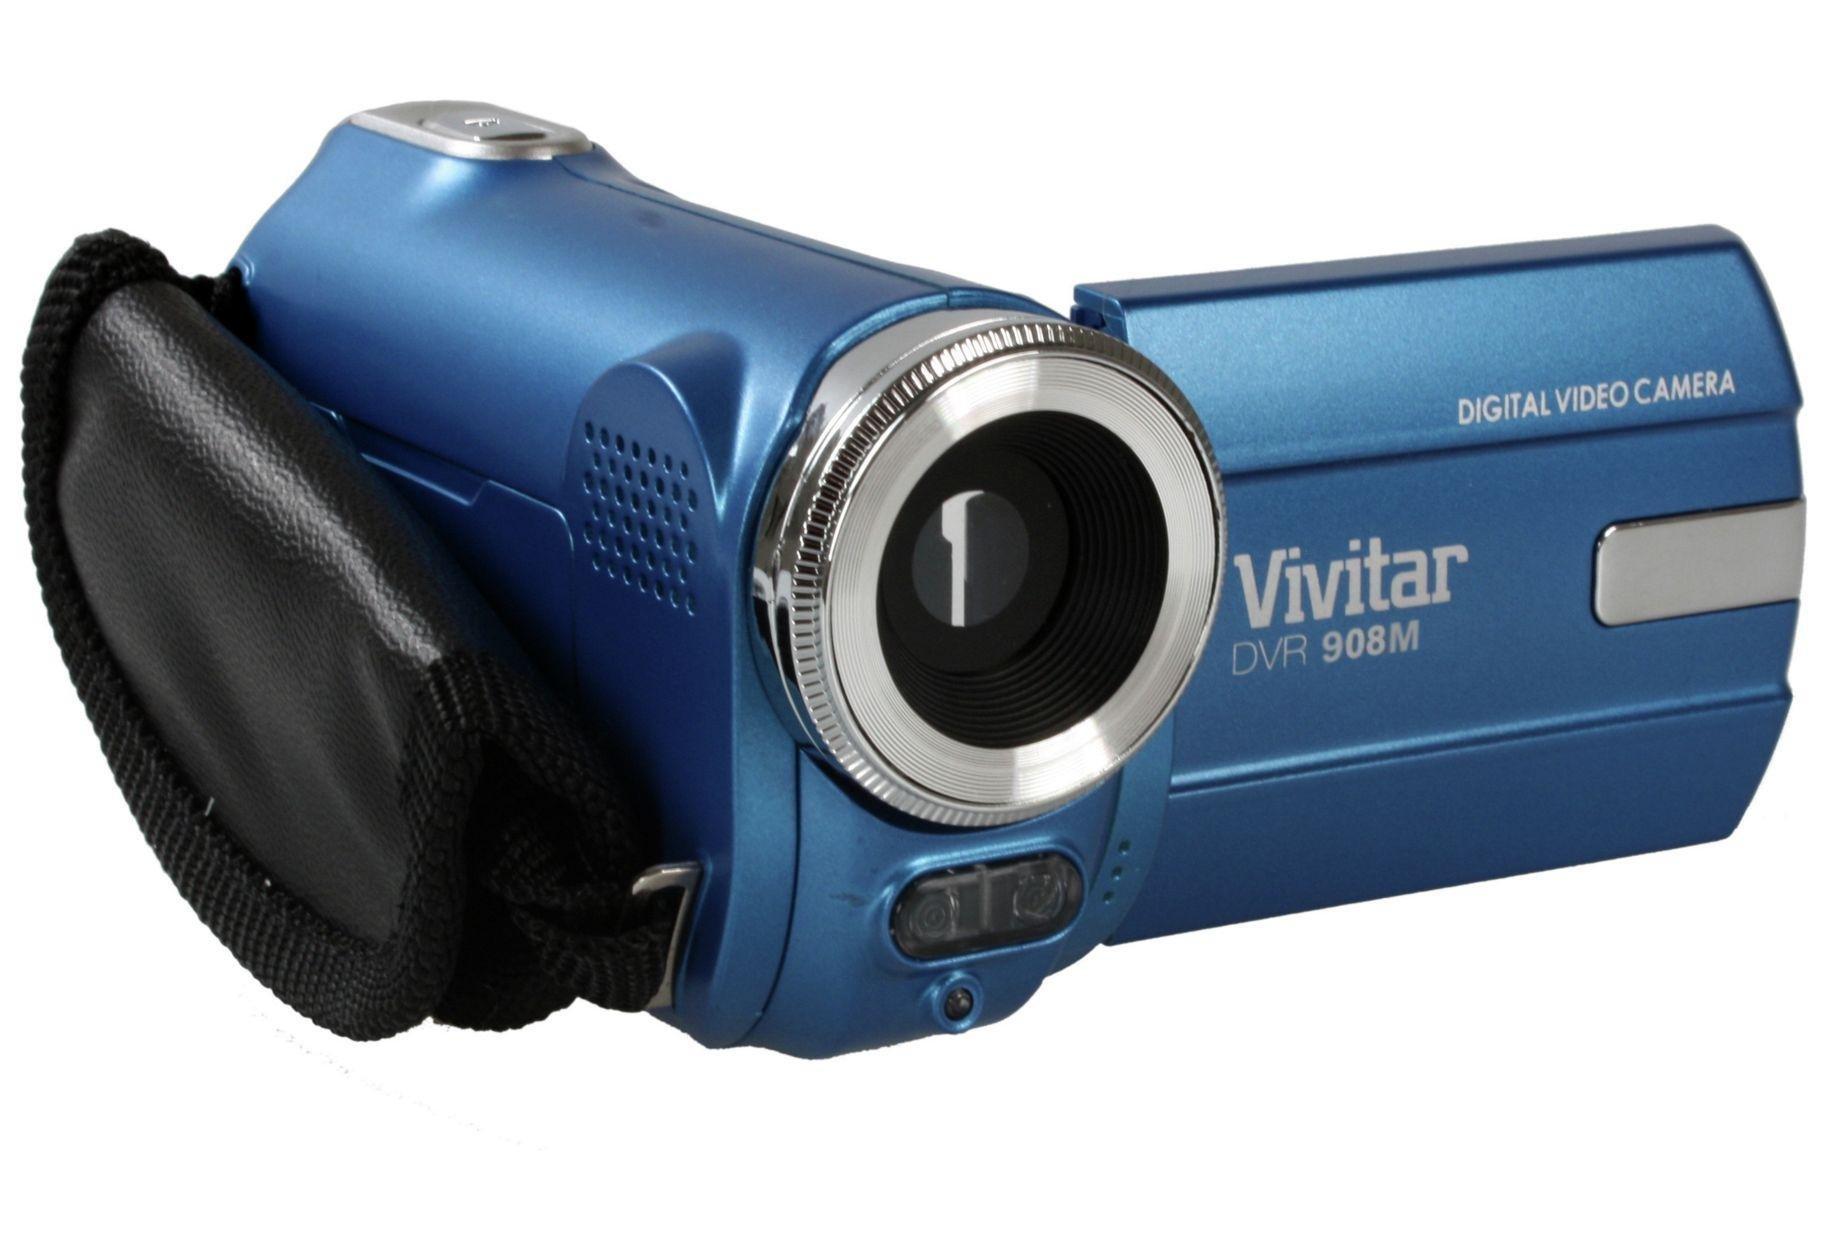 Vivitar - DVR908M Full HD Kids Camcorder - Blue